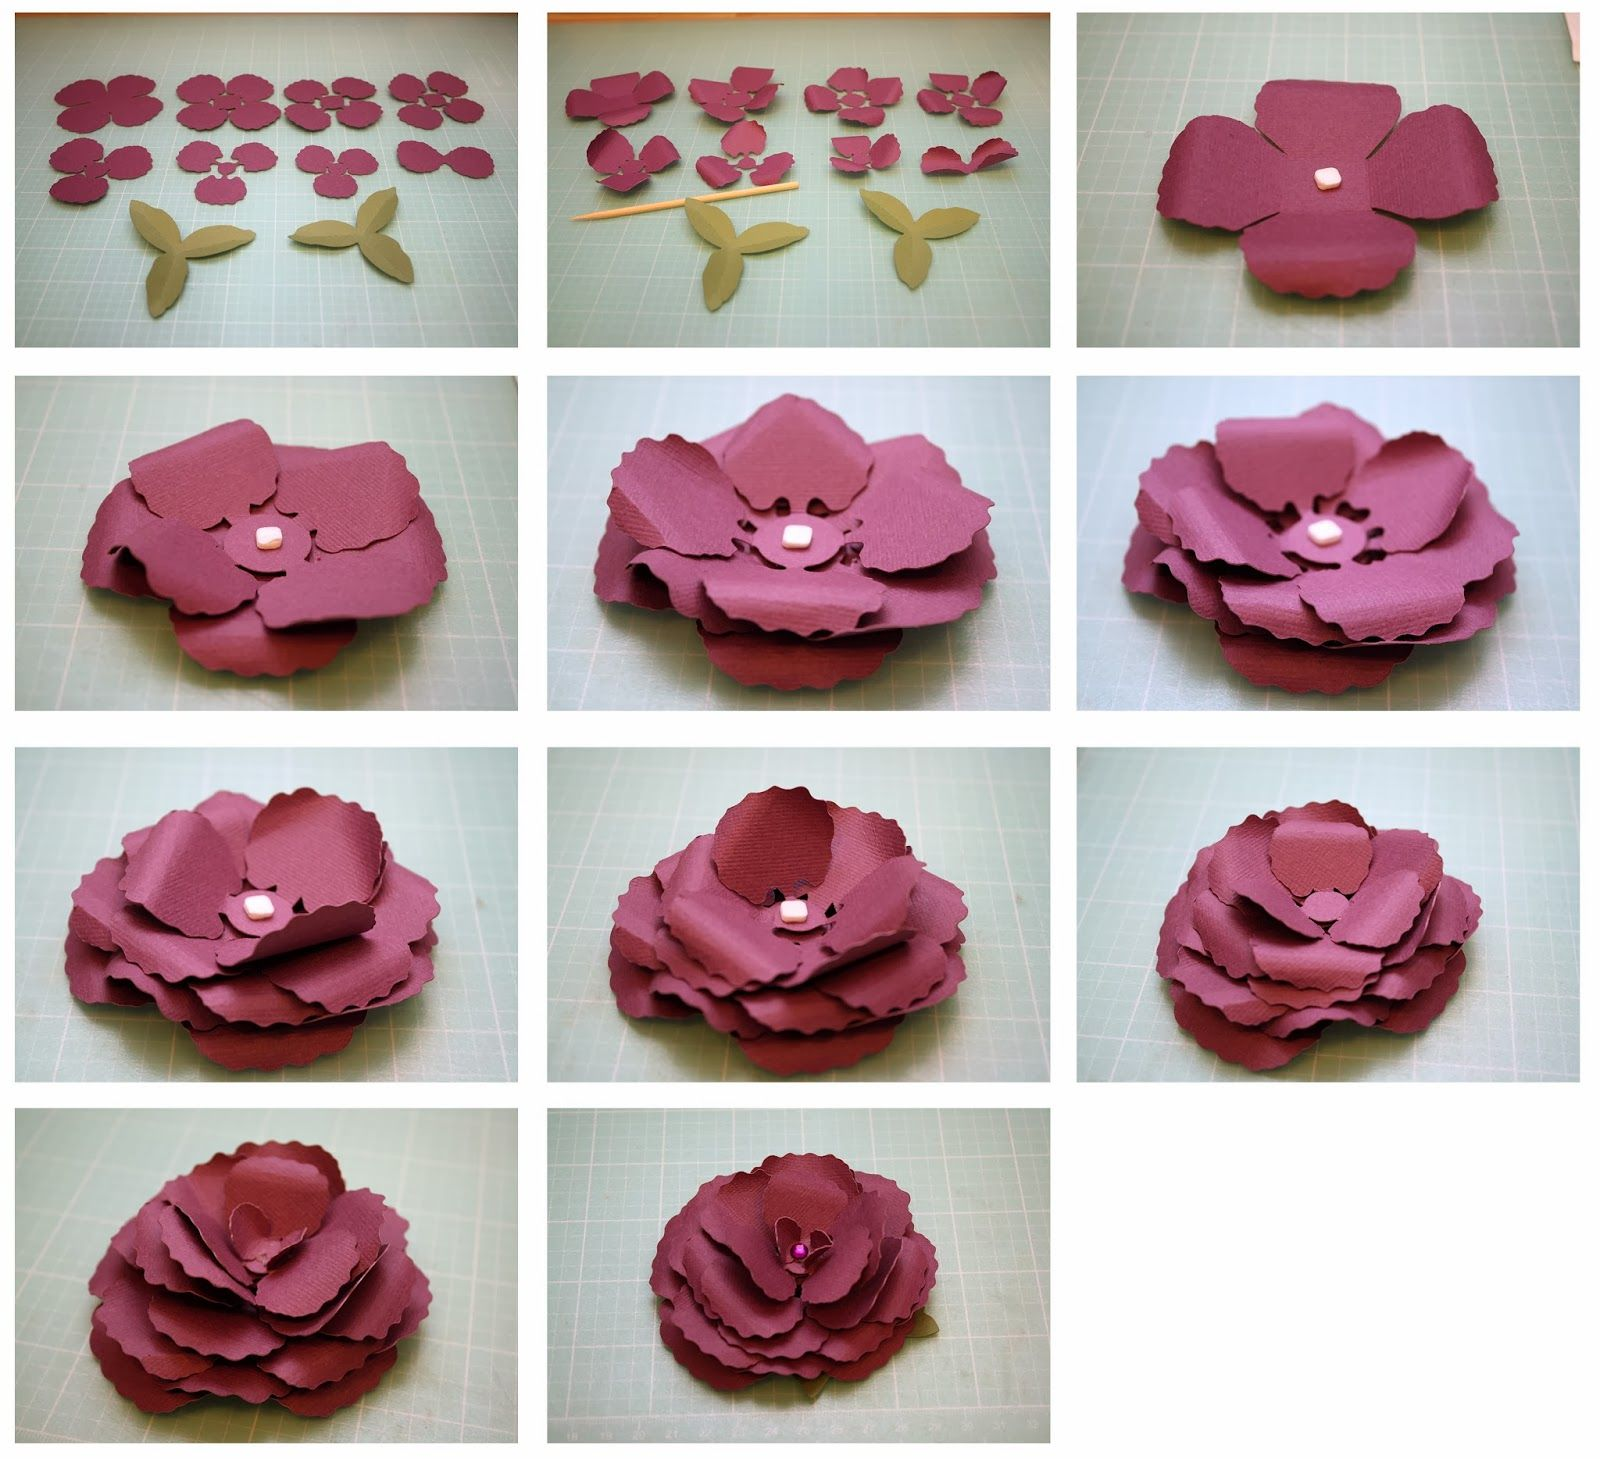 Begonia and gardenia 3d paper flowers tutorials pinterest 3d begonia and gardenia 3d paper flowers mightylinksfo